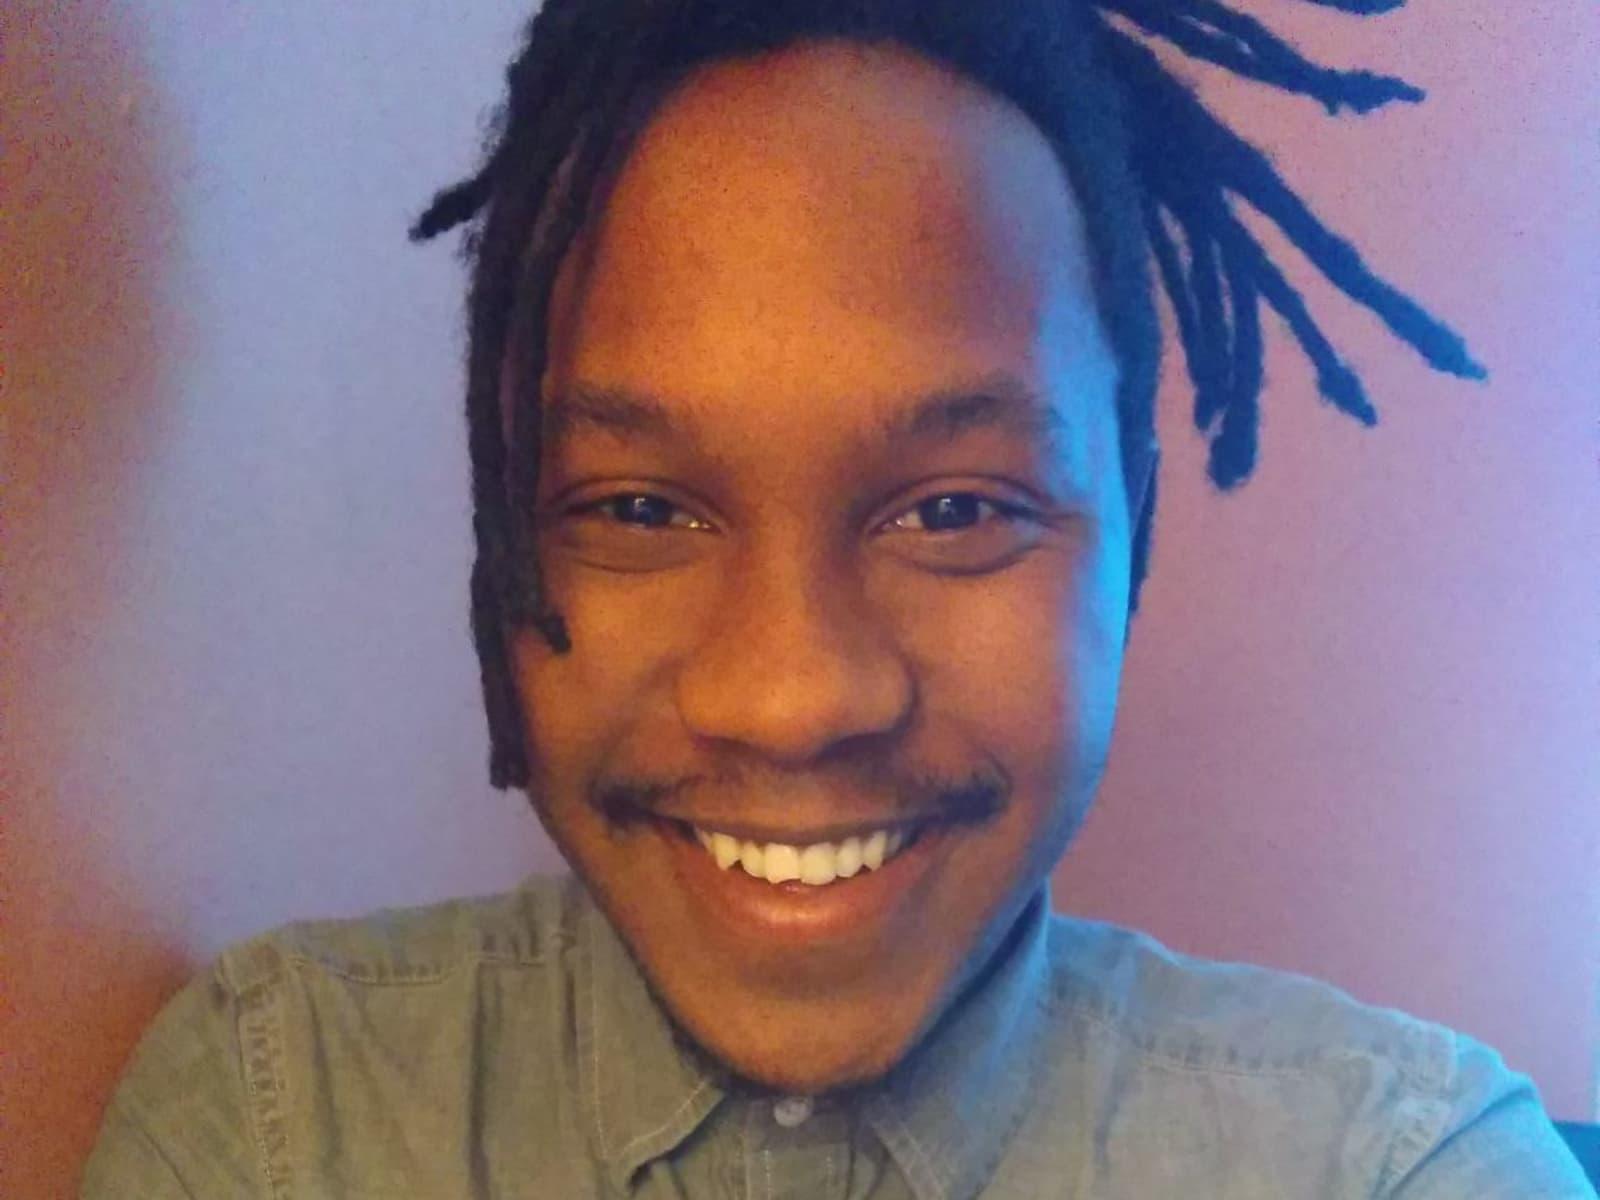 Jonathan from Atlanta, Georgia, United States